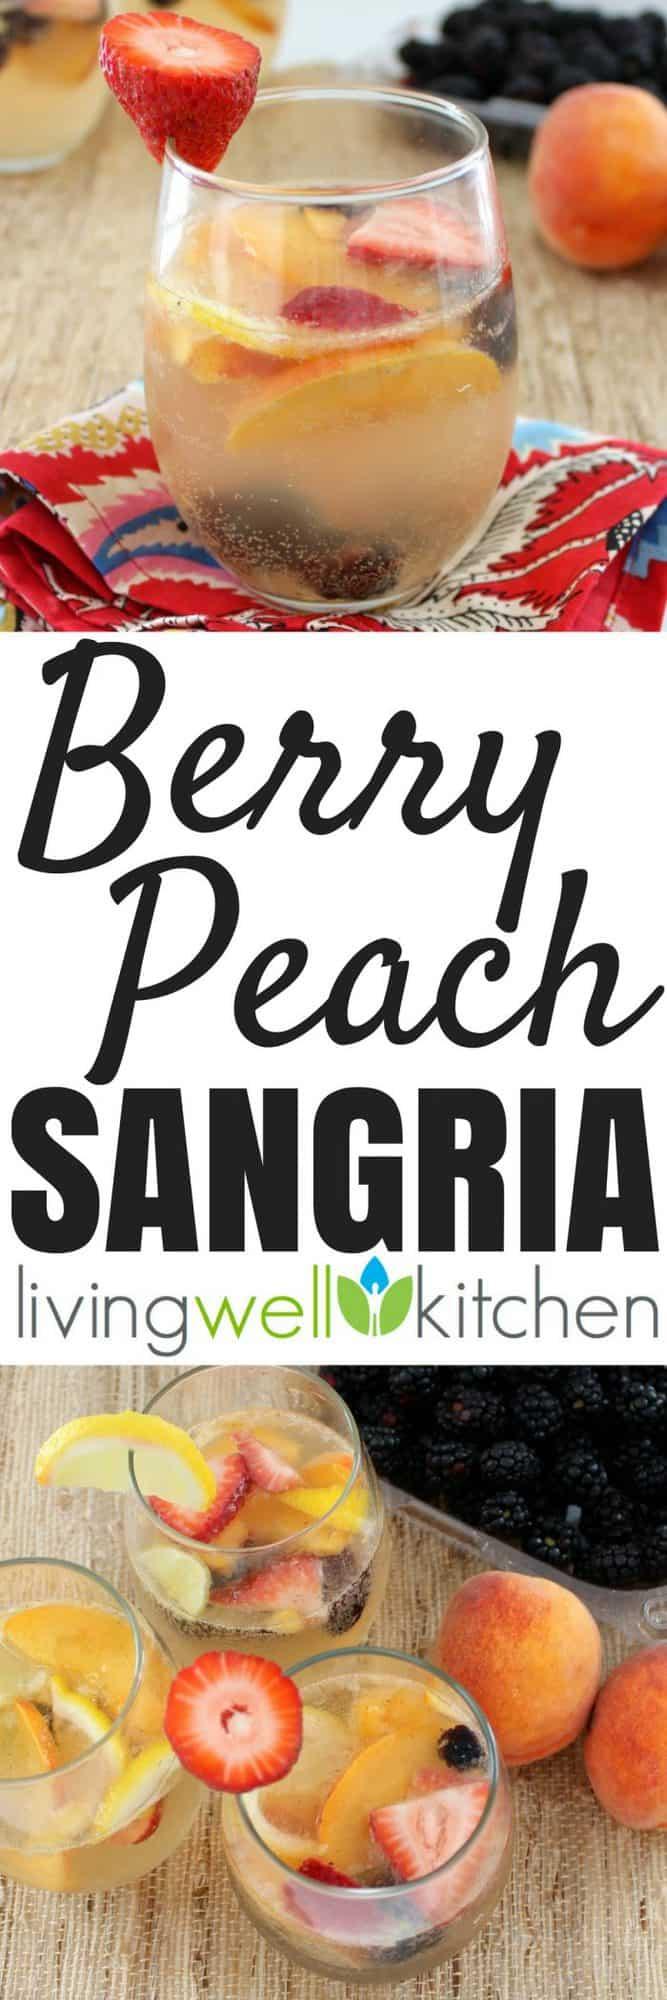 Berry Peach Sangria collage